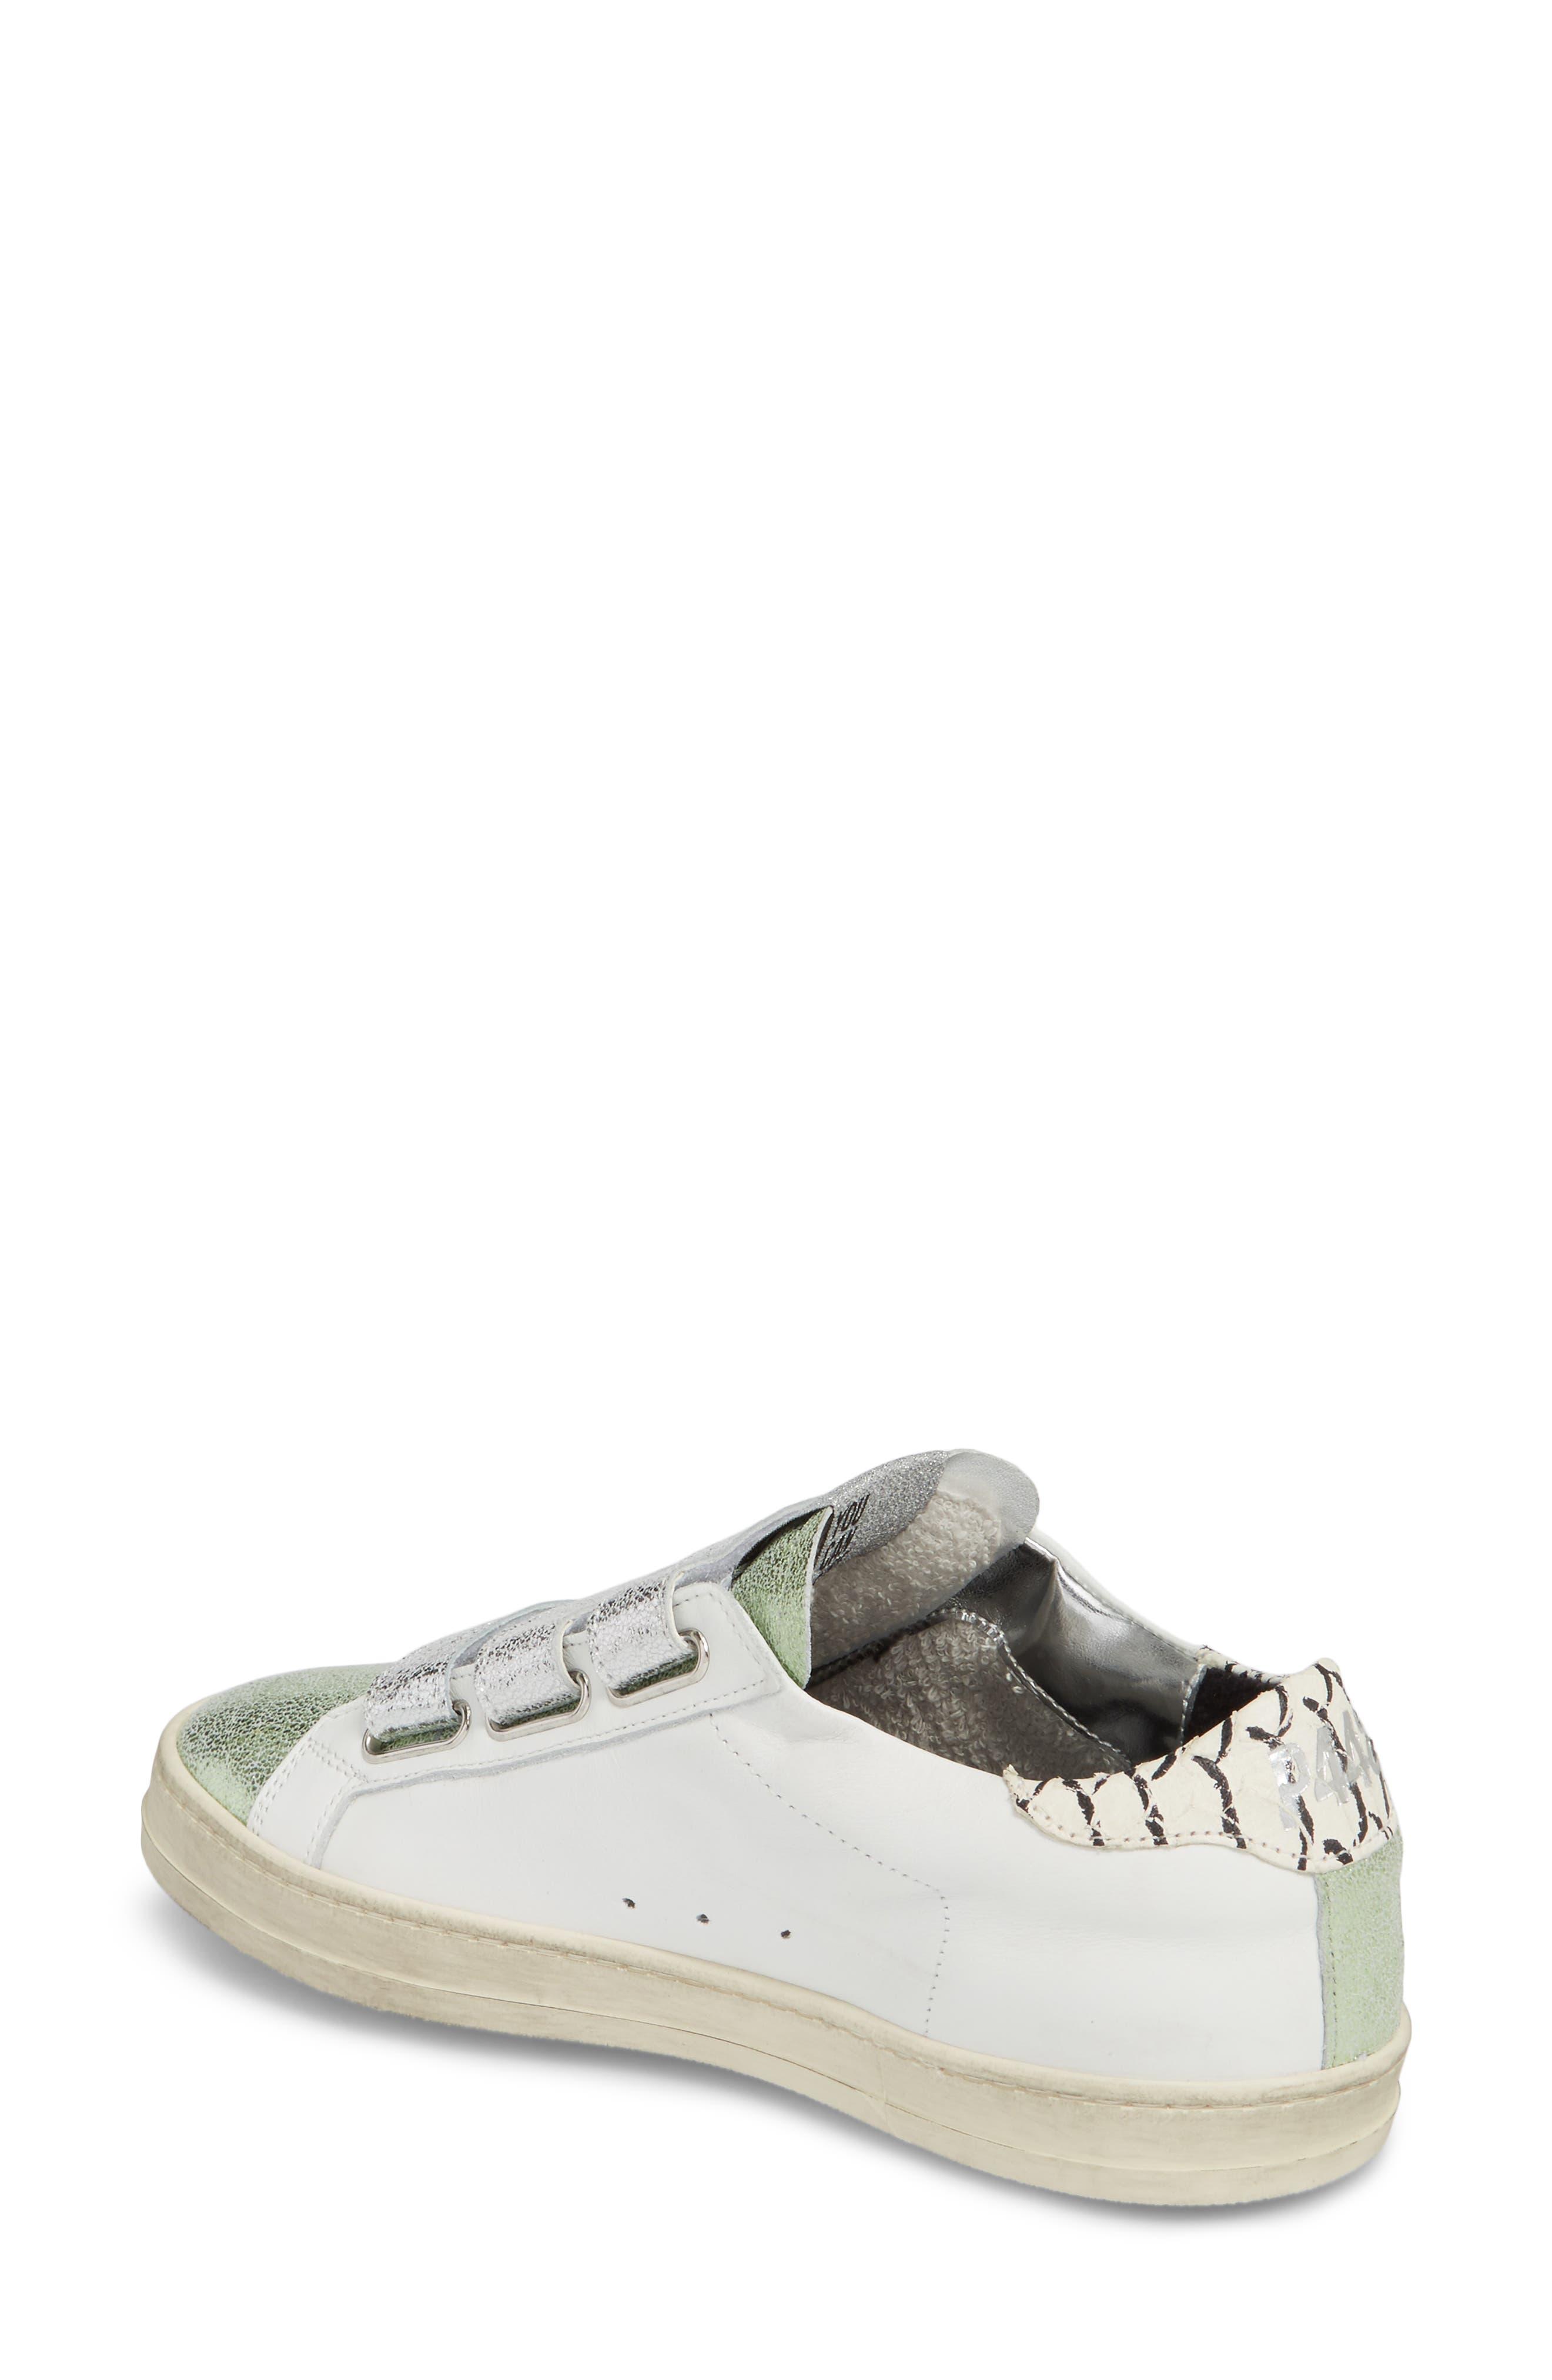 Ralph Sneaker,                             Alternate thumbnail 2, color,                             300